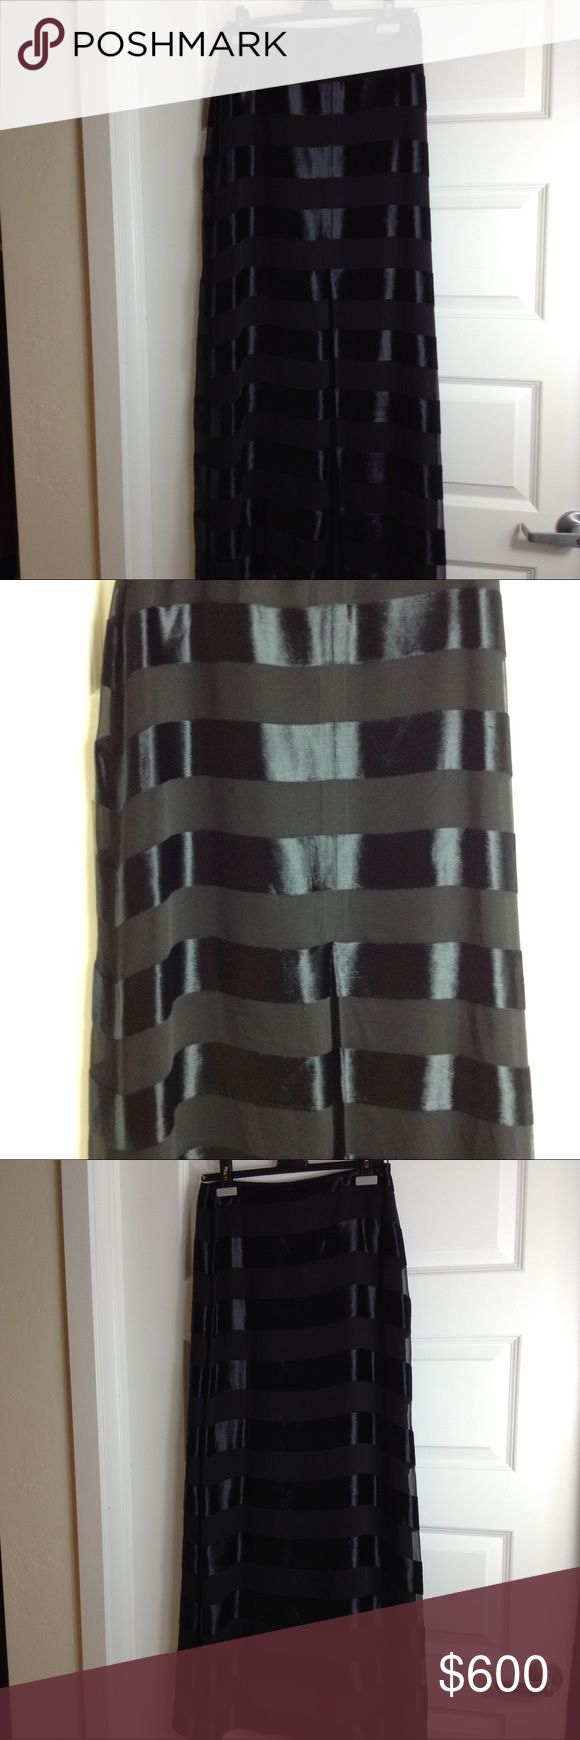 Giorgio Armani Maxi Skirt Giorgio Armani black and velvet stripe Maxi Skirt with front slit Giorgio Armani Skirts Maxi